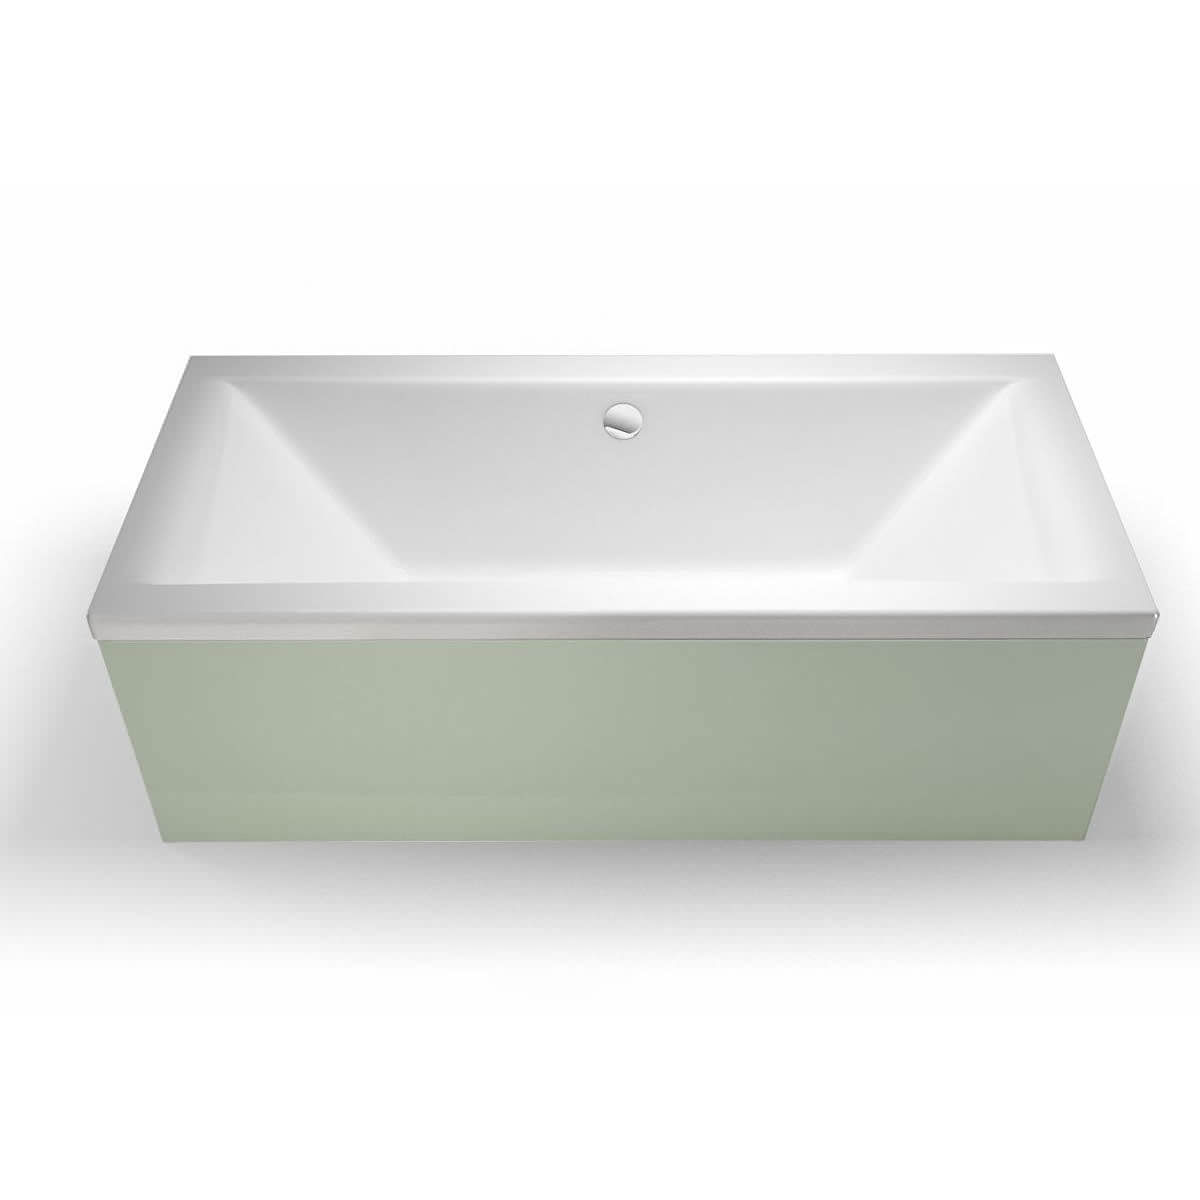 Britton Cleargreen Enviro 1800 x 800mm Double Ended Bath